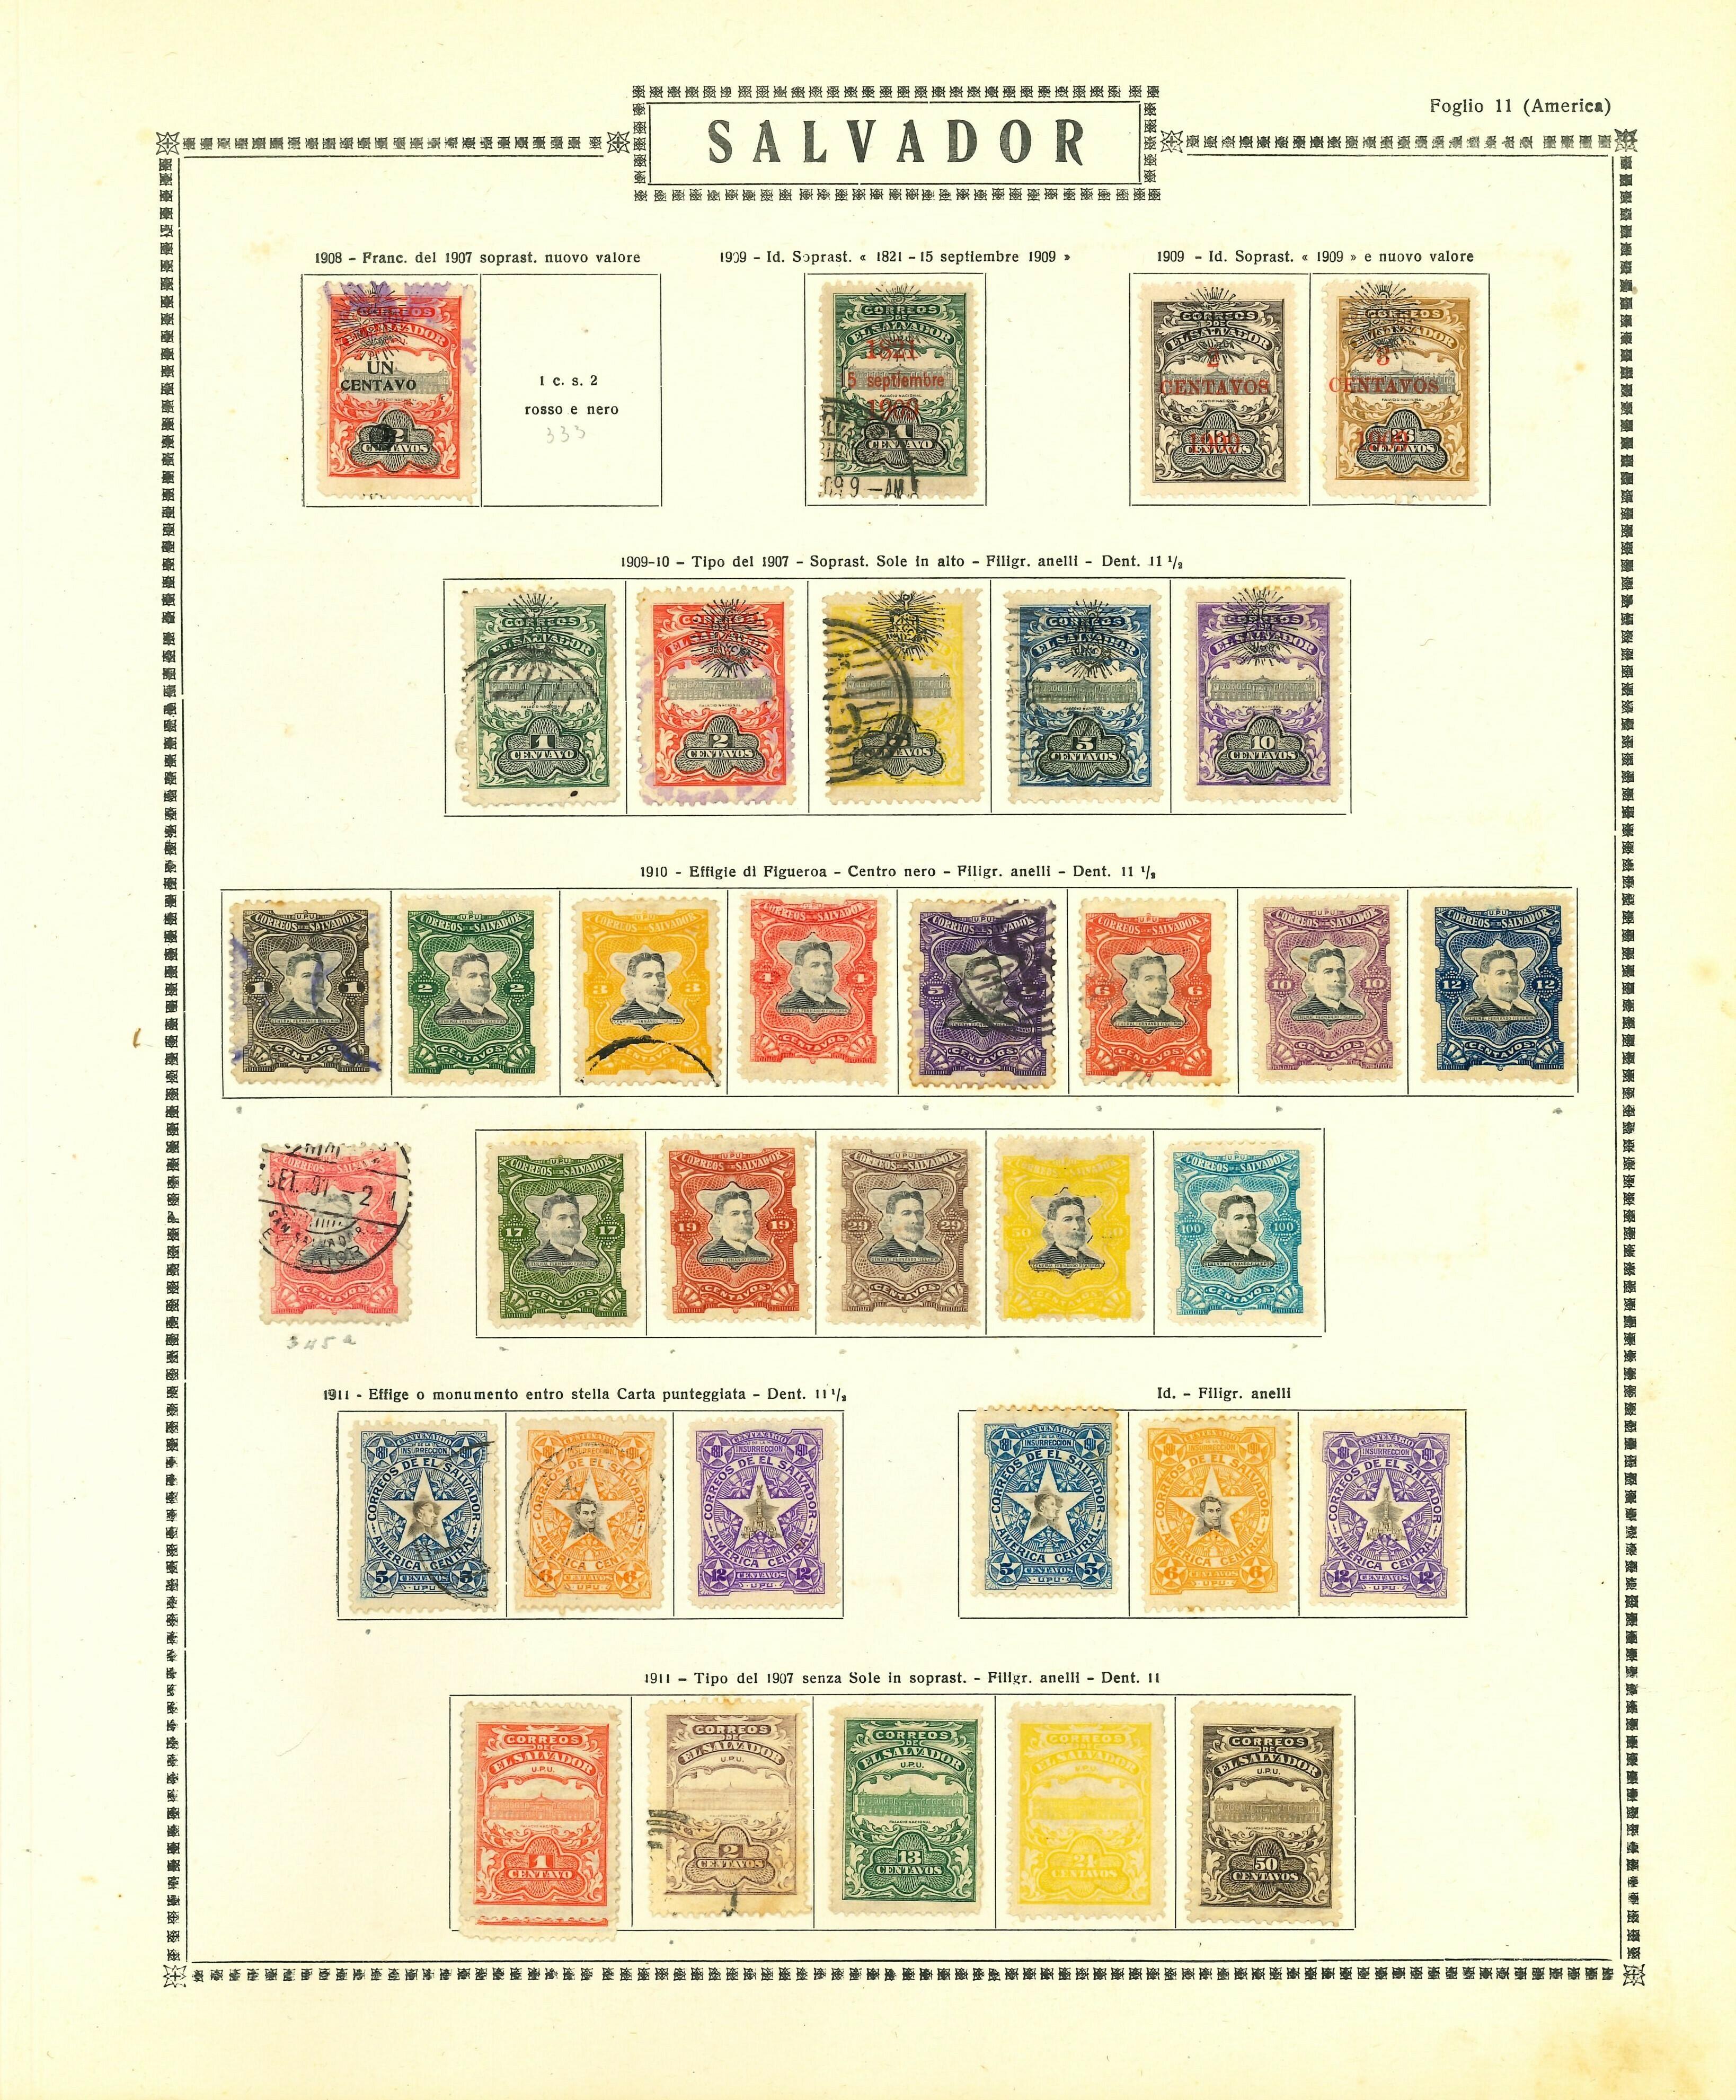 Lot 2337 - salvador Lots & Collections -  Ponte Auction House Stamps Auction 505